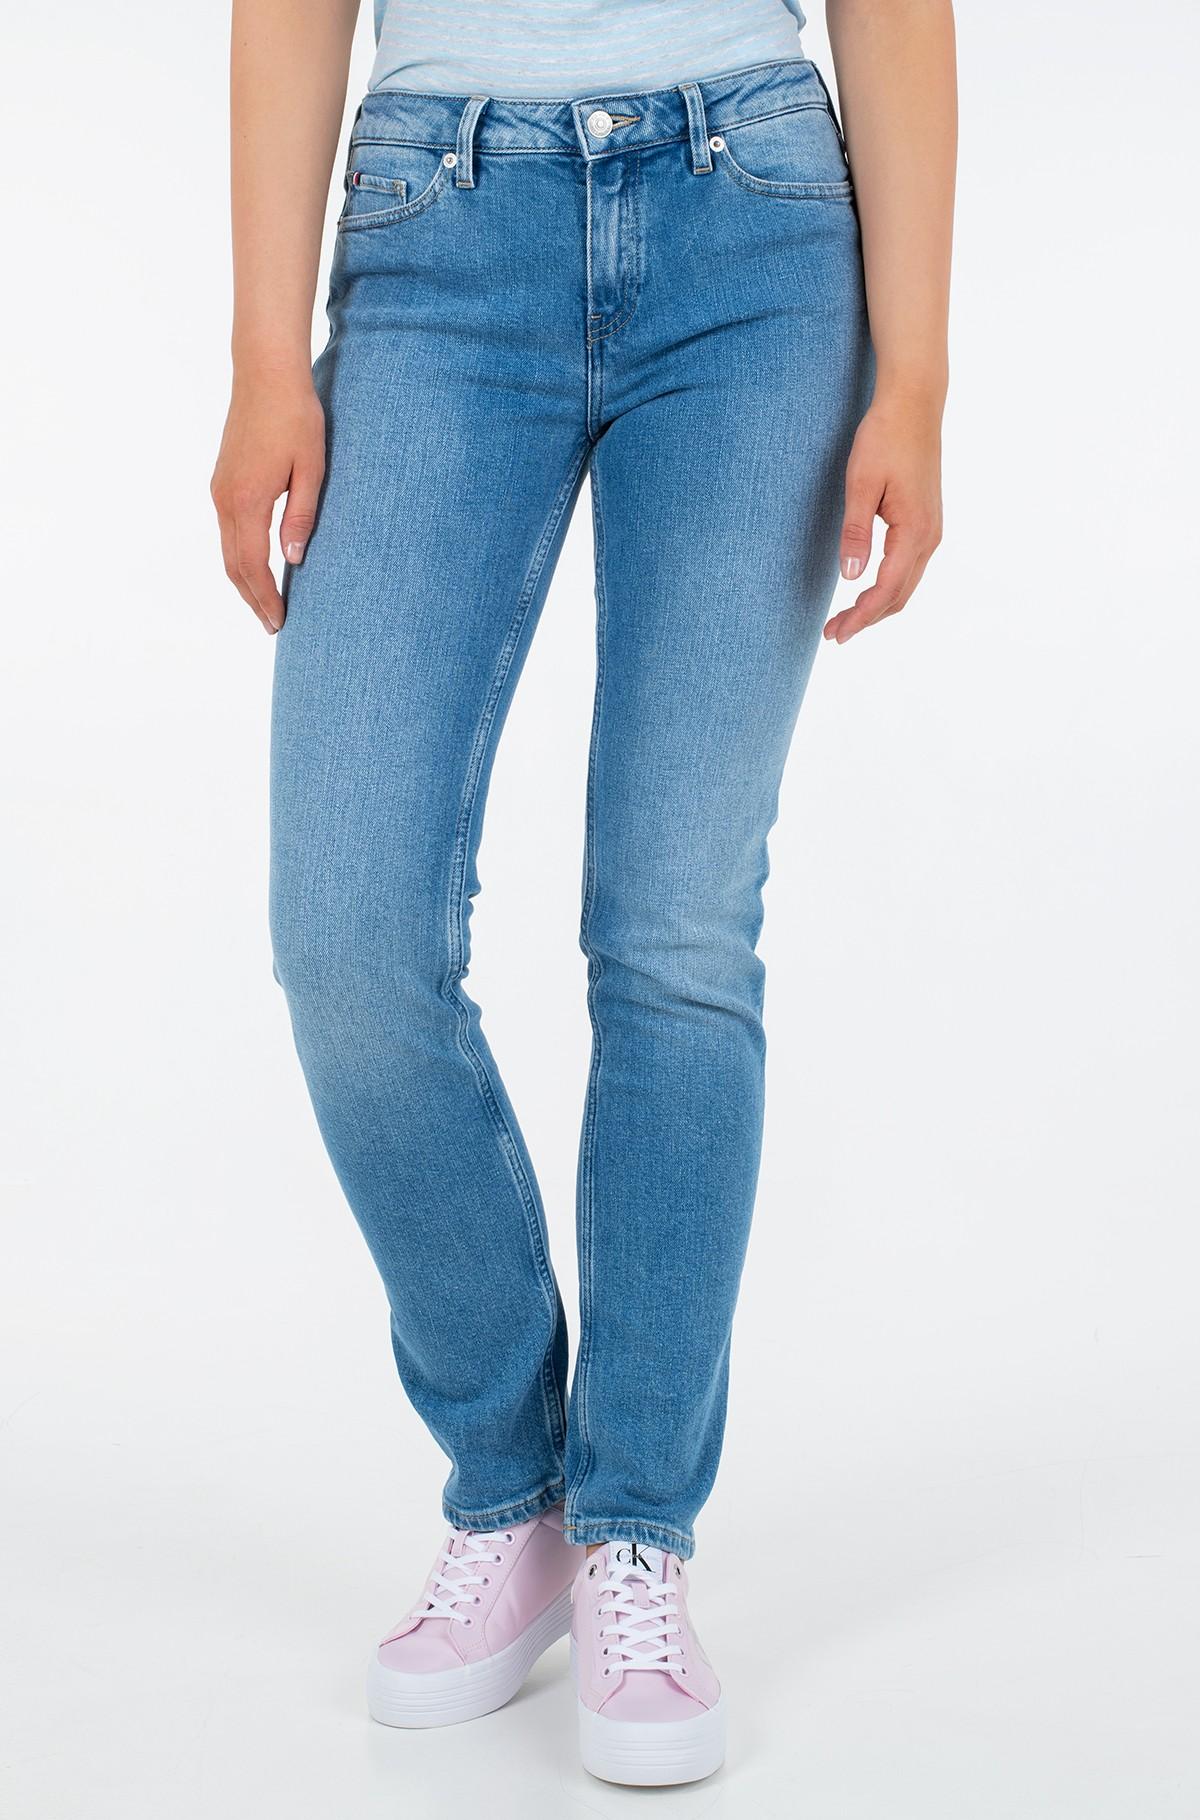 Jeans ROME STRAIGHT RW JUL-full-1